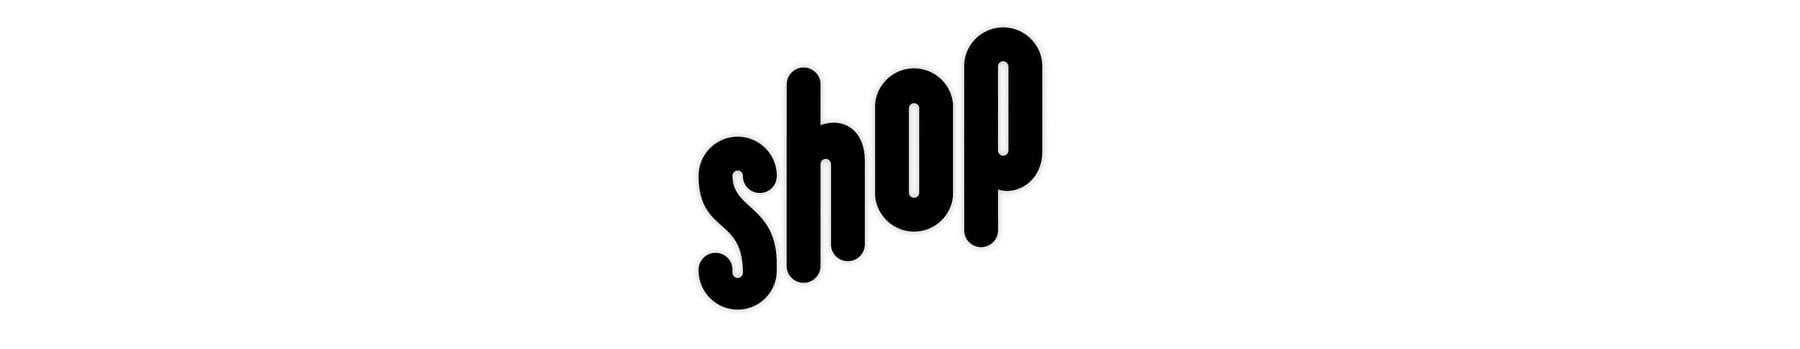 Made Up Shop